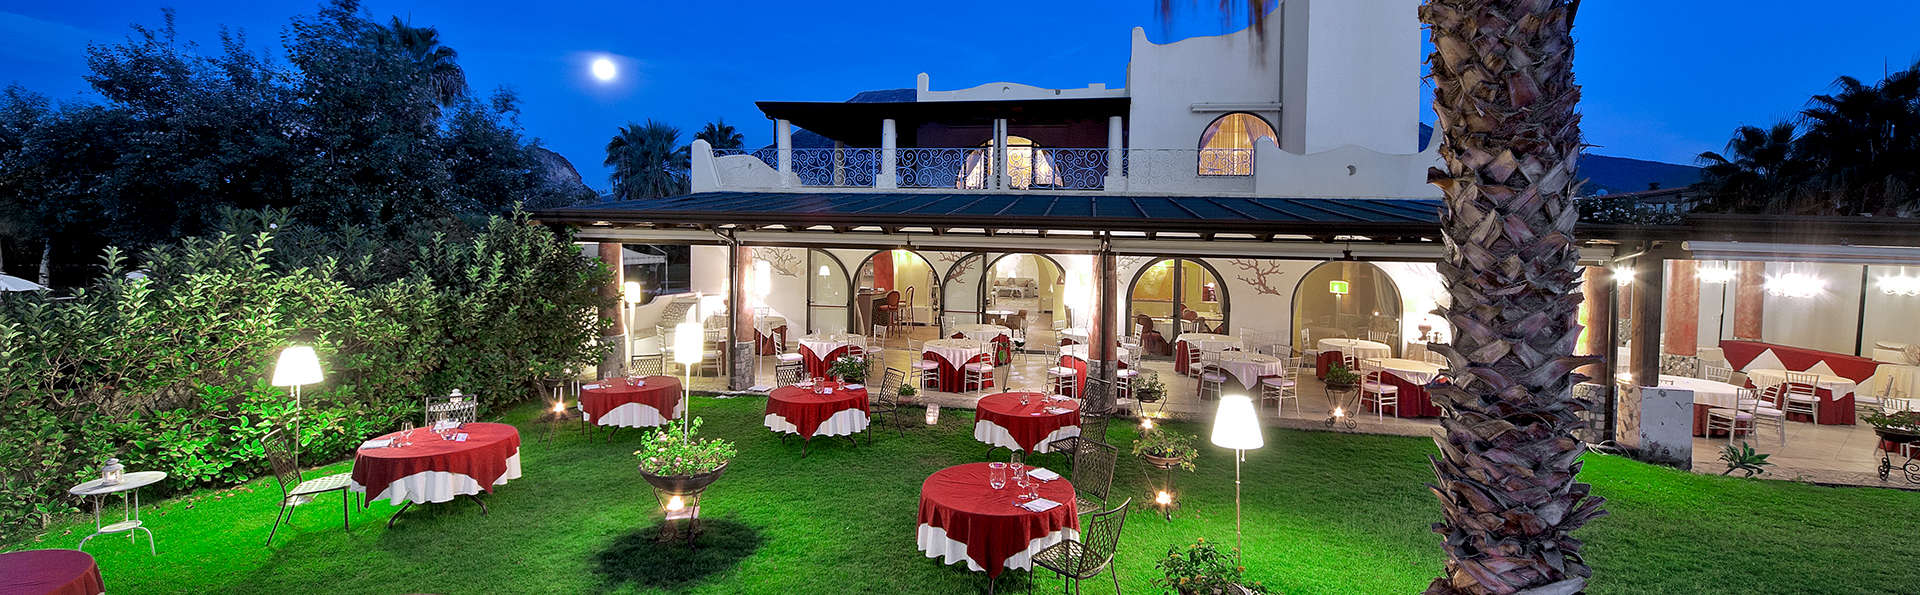 Hotel Garden - EDIT_NEW_FRONT2.jpg